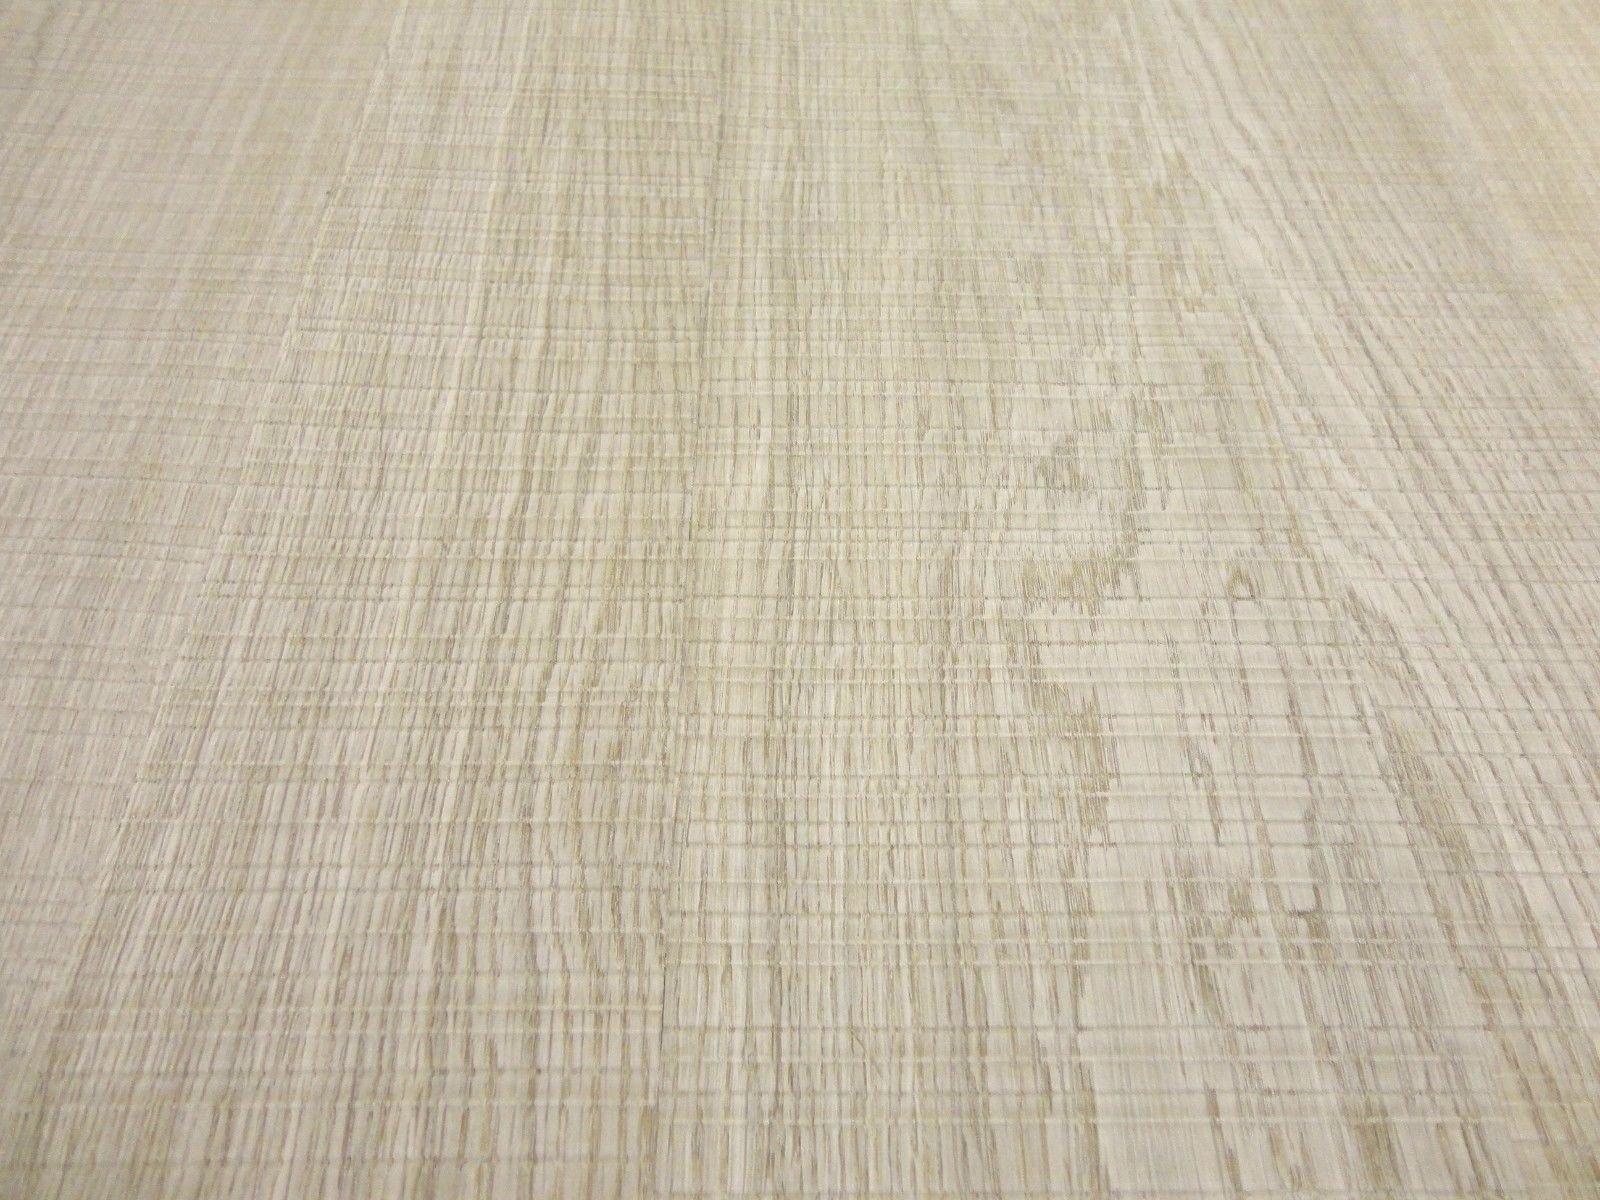 Rough Sawn White Oak wood veneer sheet 48'' x 96'' with paper backer 1/40th'' thick